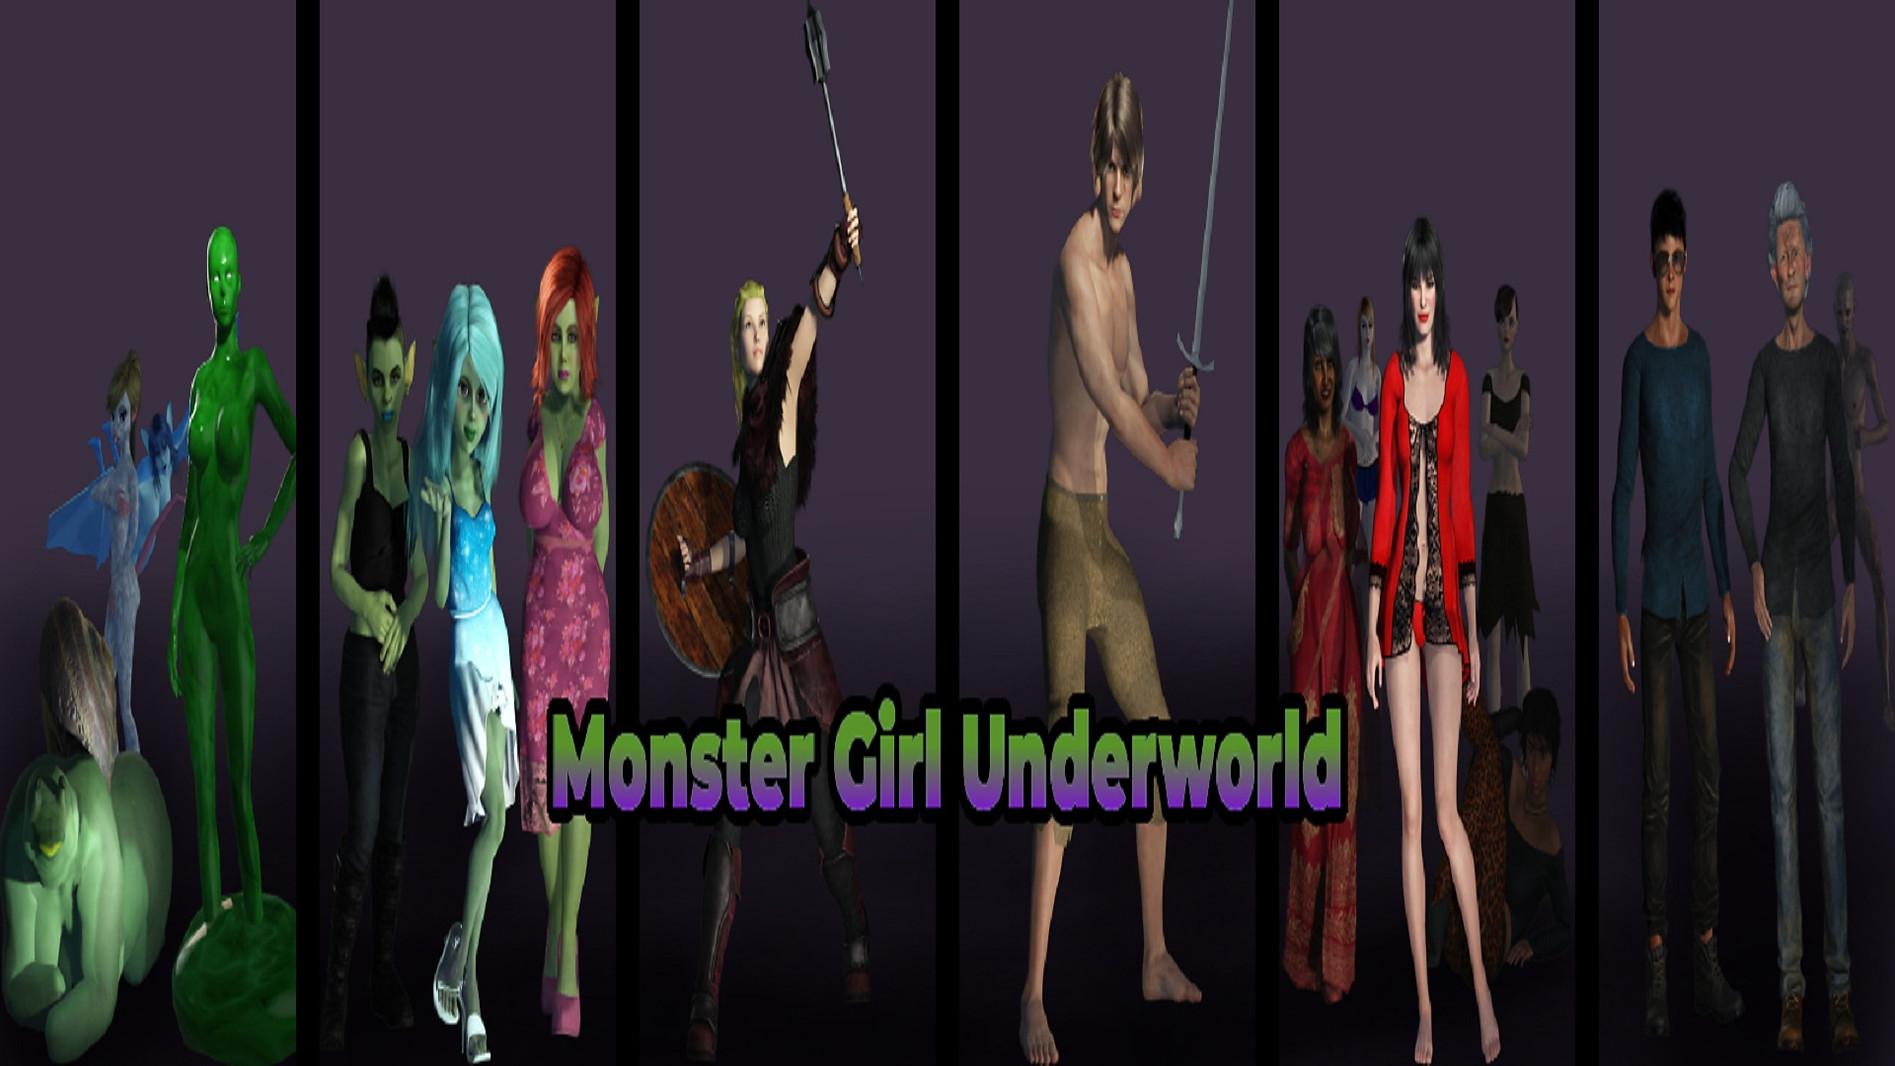 Monster Girl Underworld The Sewers of Sh